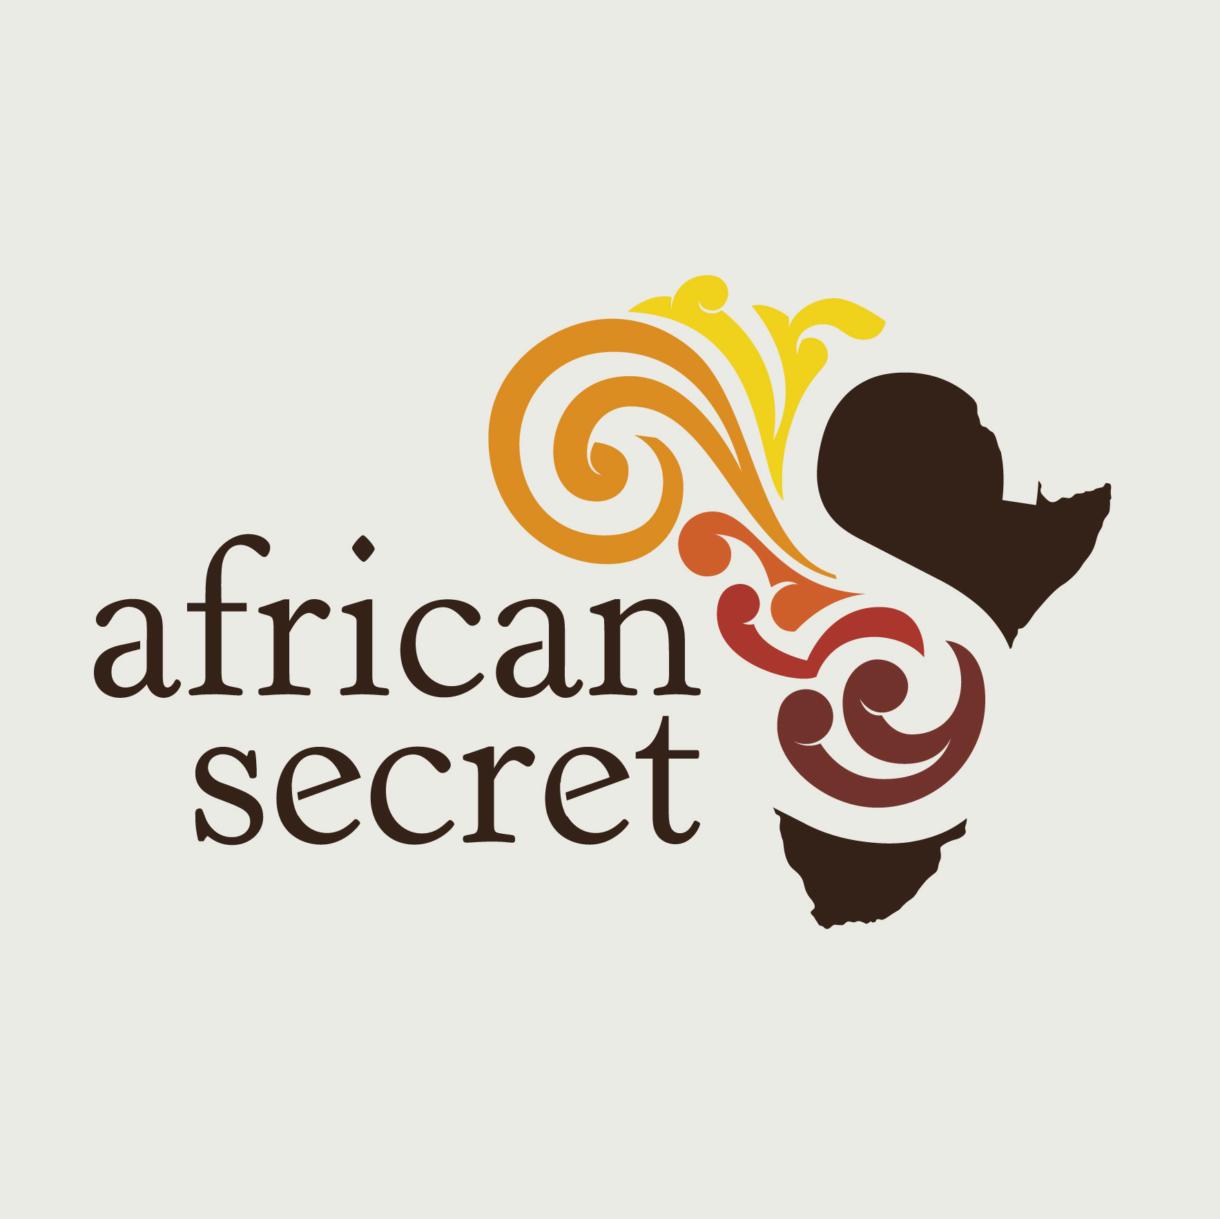 African Secret